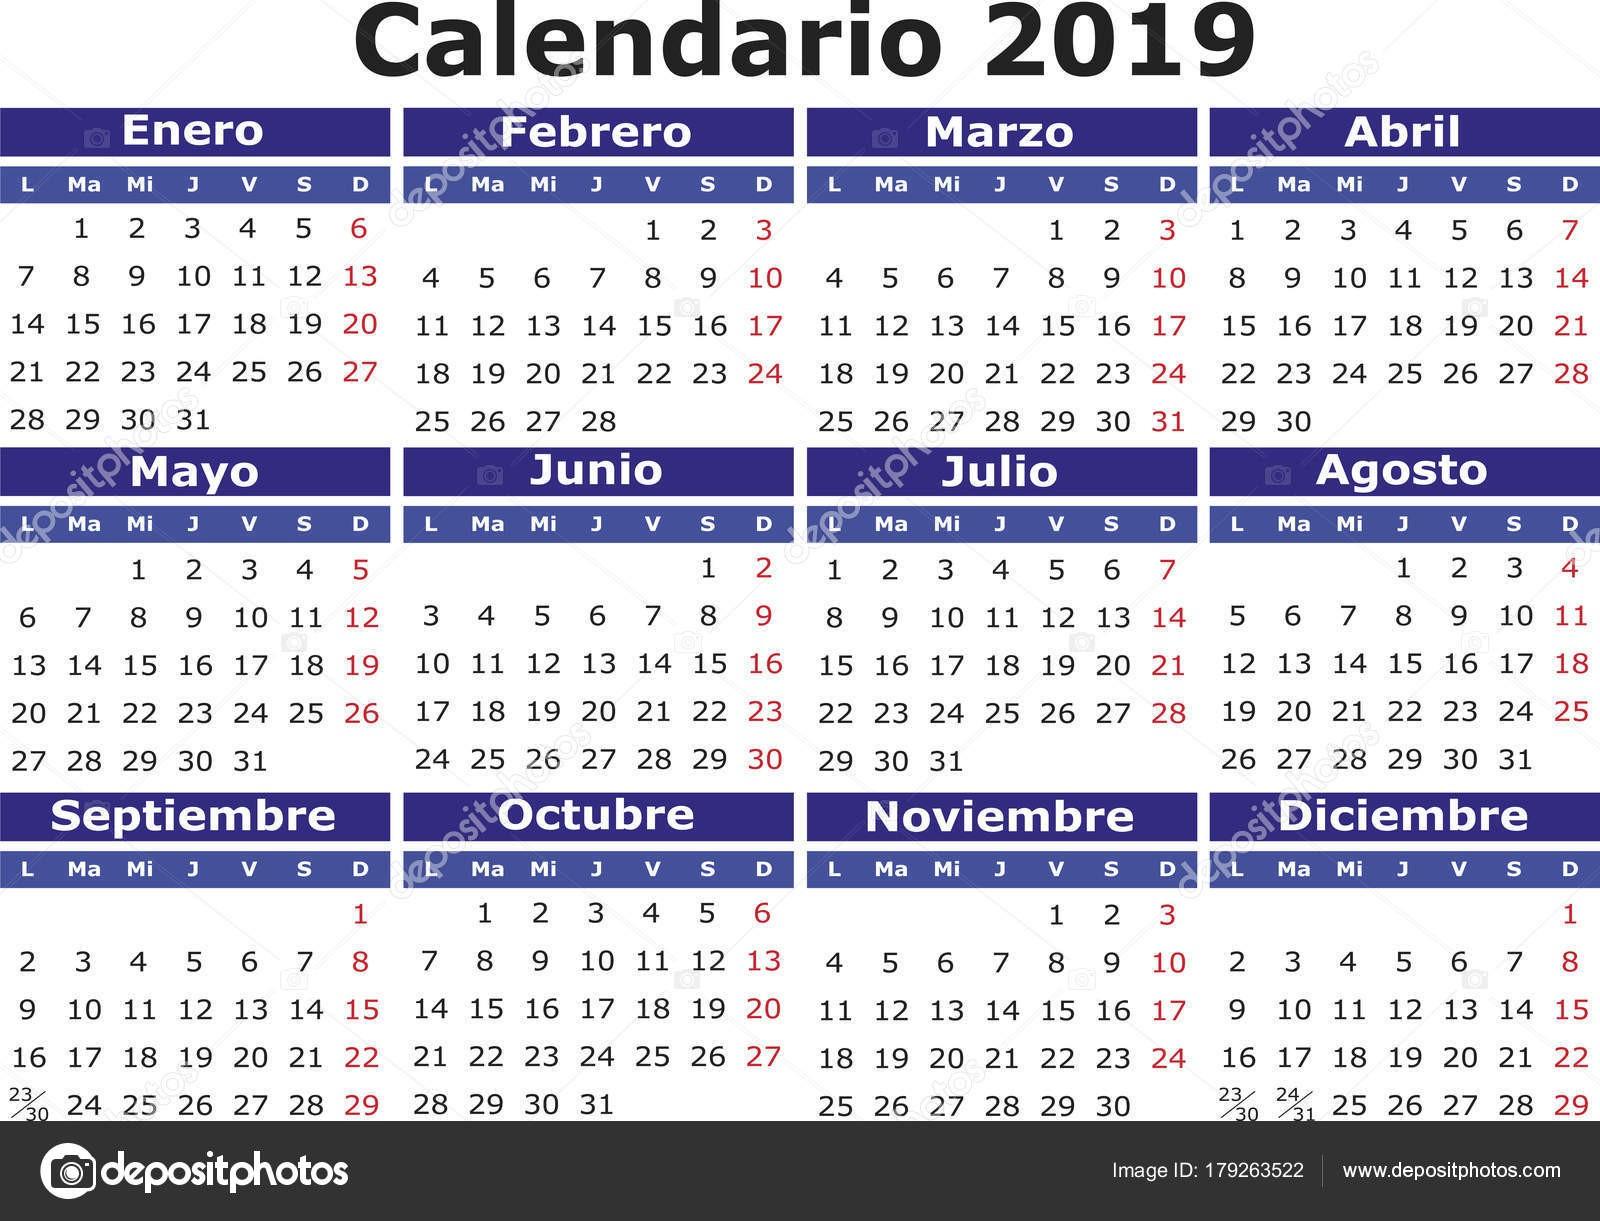 Calendario 2019 Brasil Actual Åpanělsk½ Kalendář 2018 Horizontáln — Stock Vektor © Alfonsodetomas